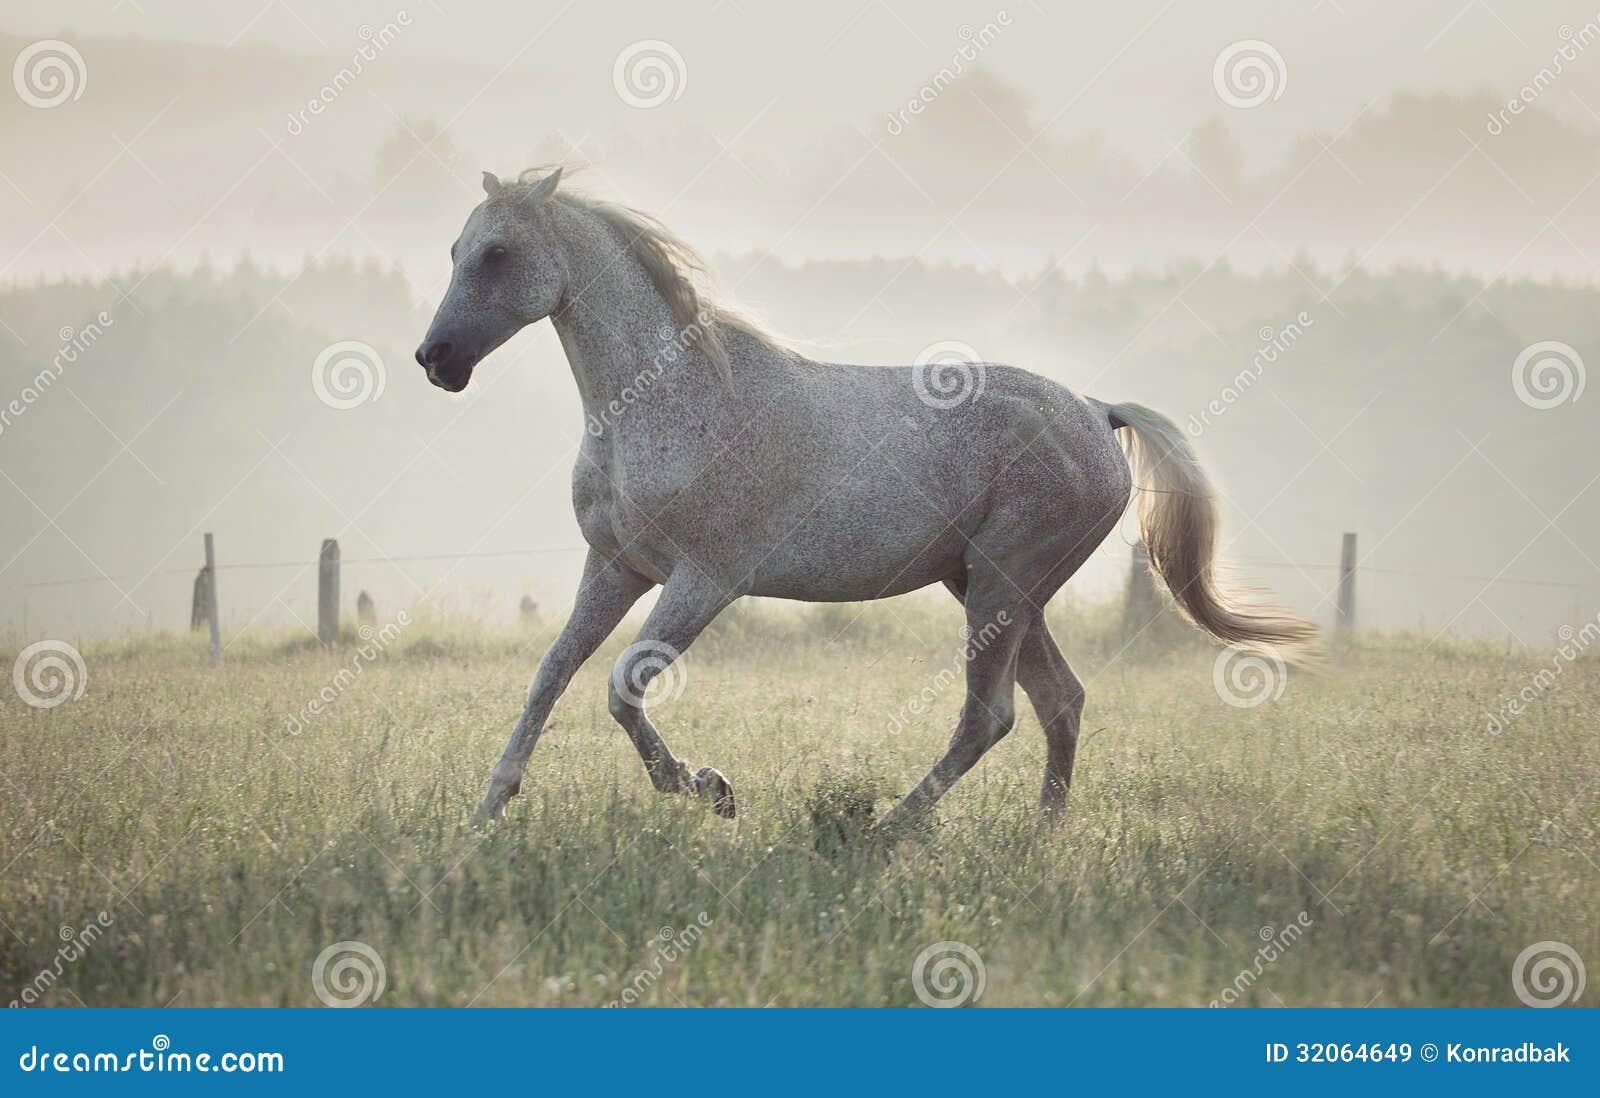 Запятнанная белая лошадь бежать через луг